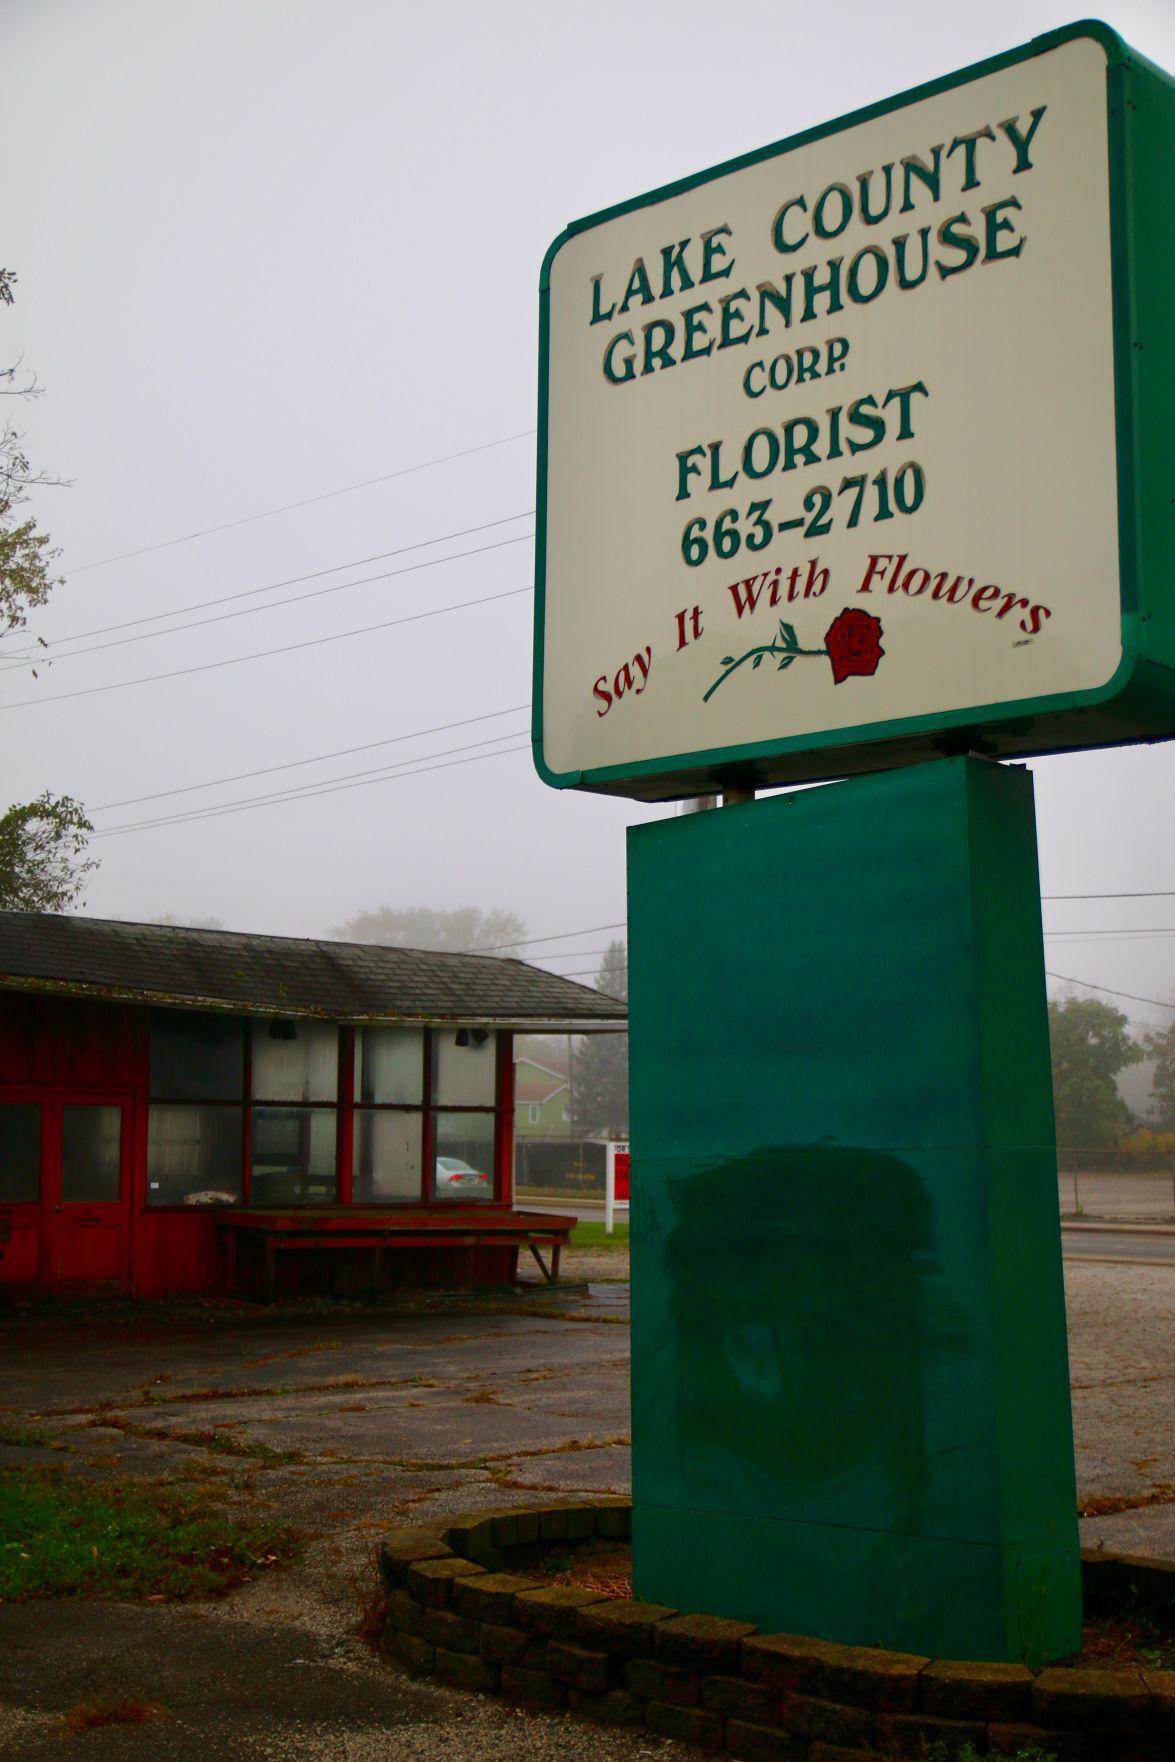 Lake County Greenhouse